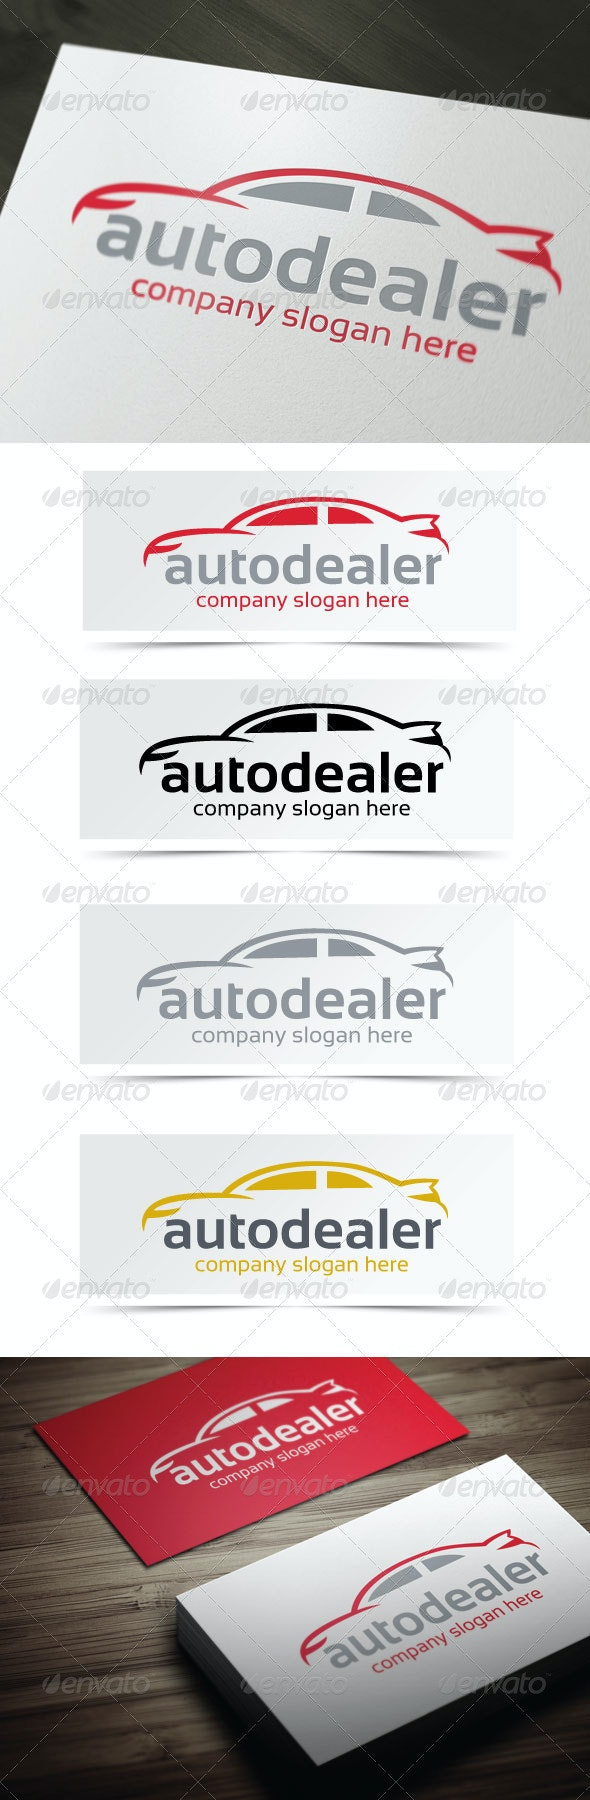 Auto Dealer - Objects Logo Templates